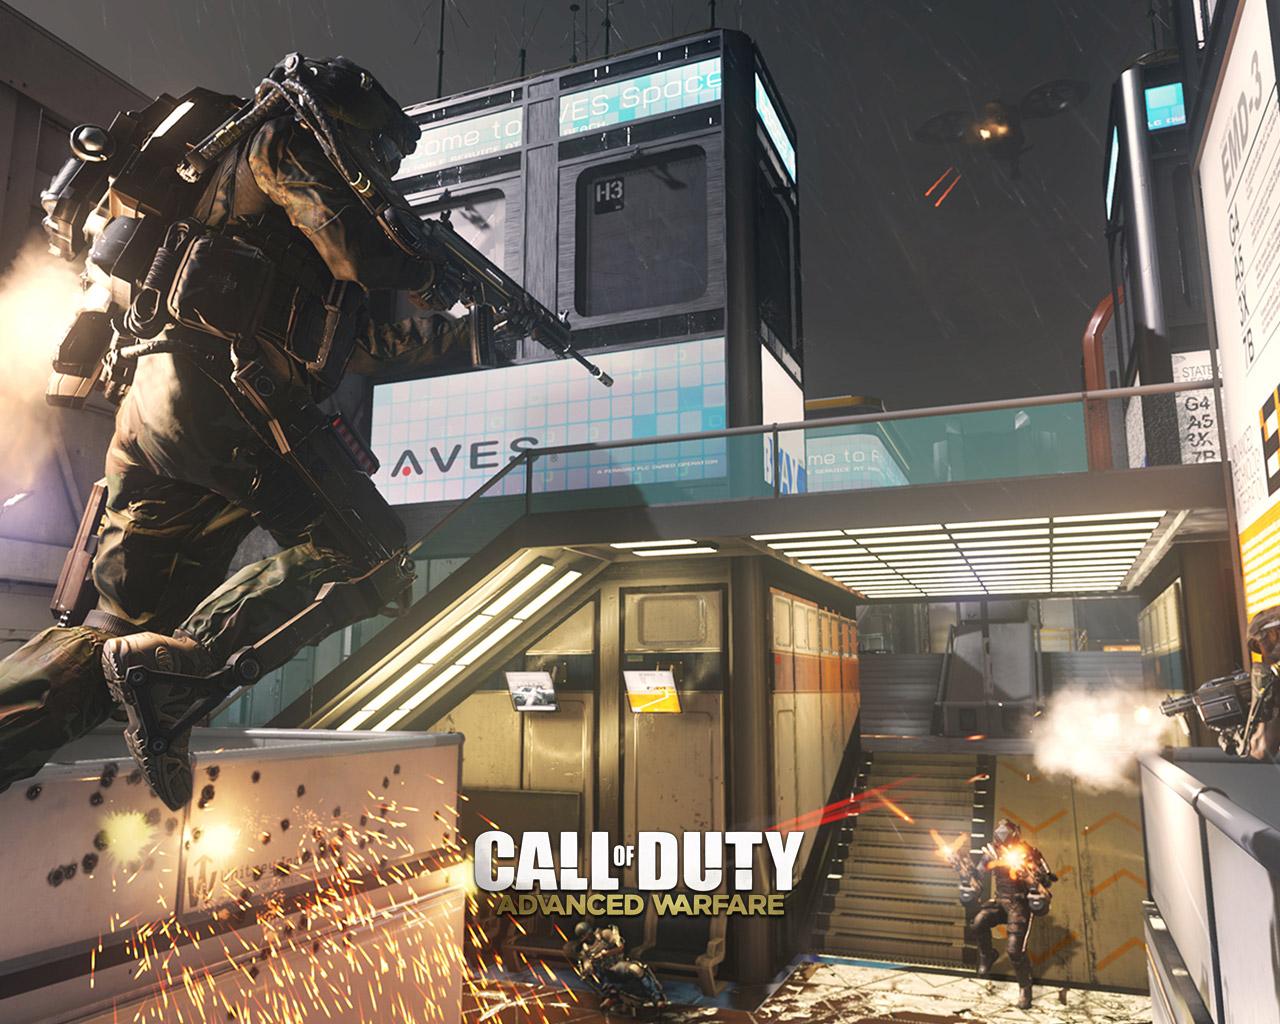 Free Call of Duty: Advanced Warfare Wallpaper in 1280x1024